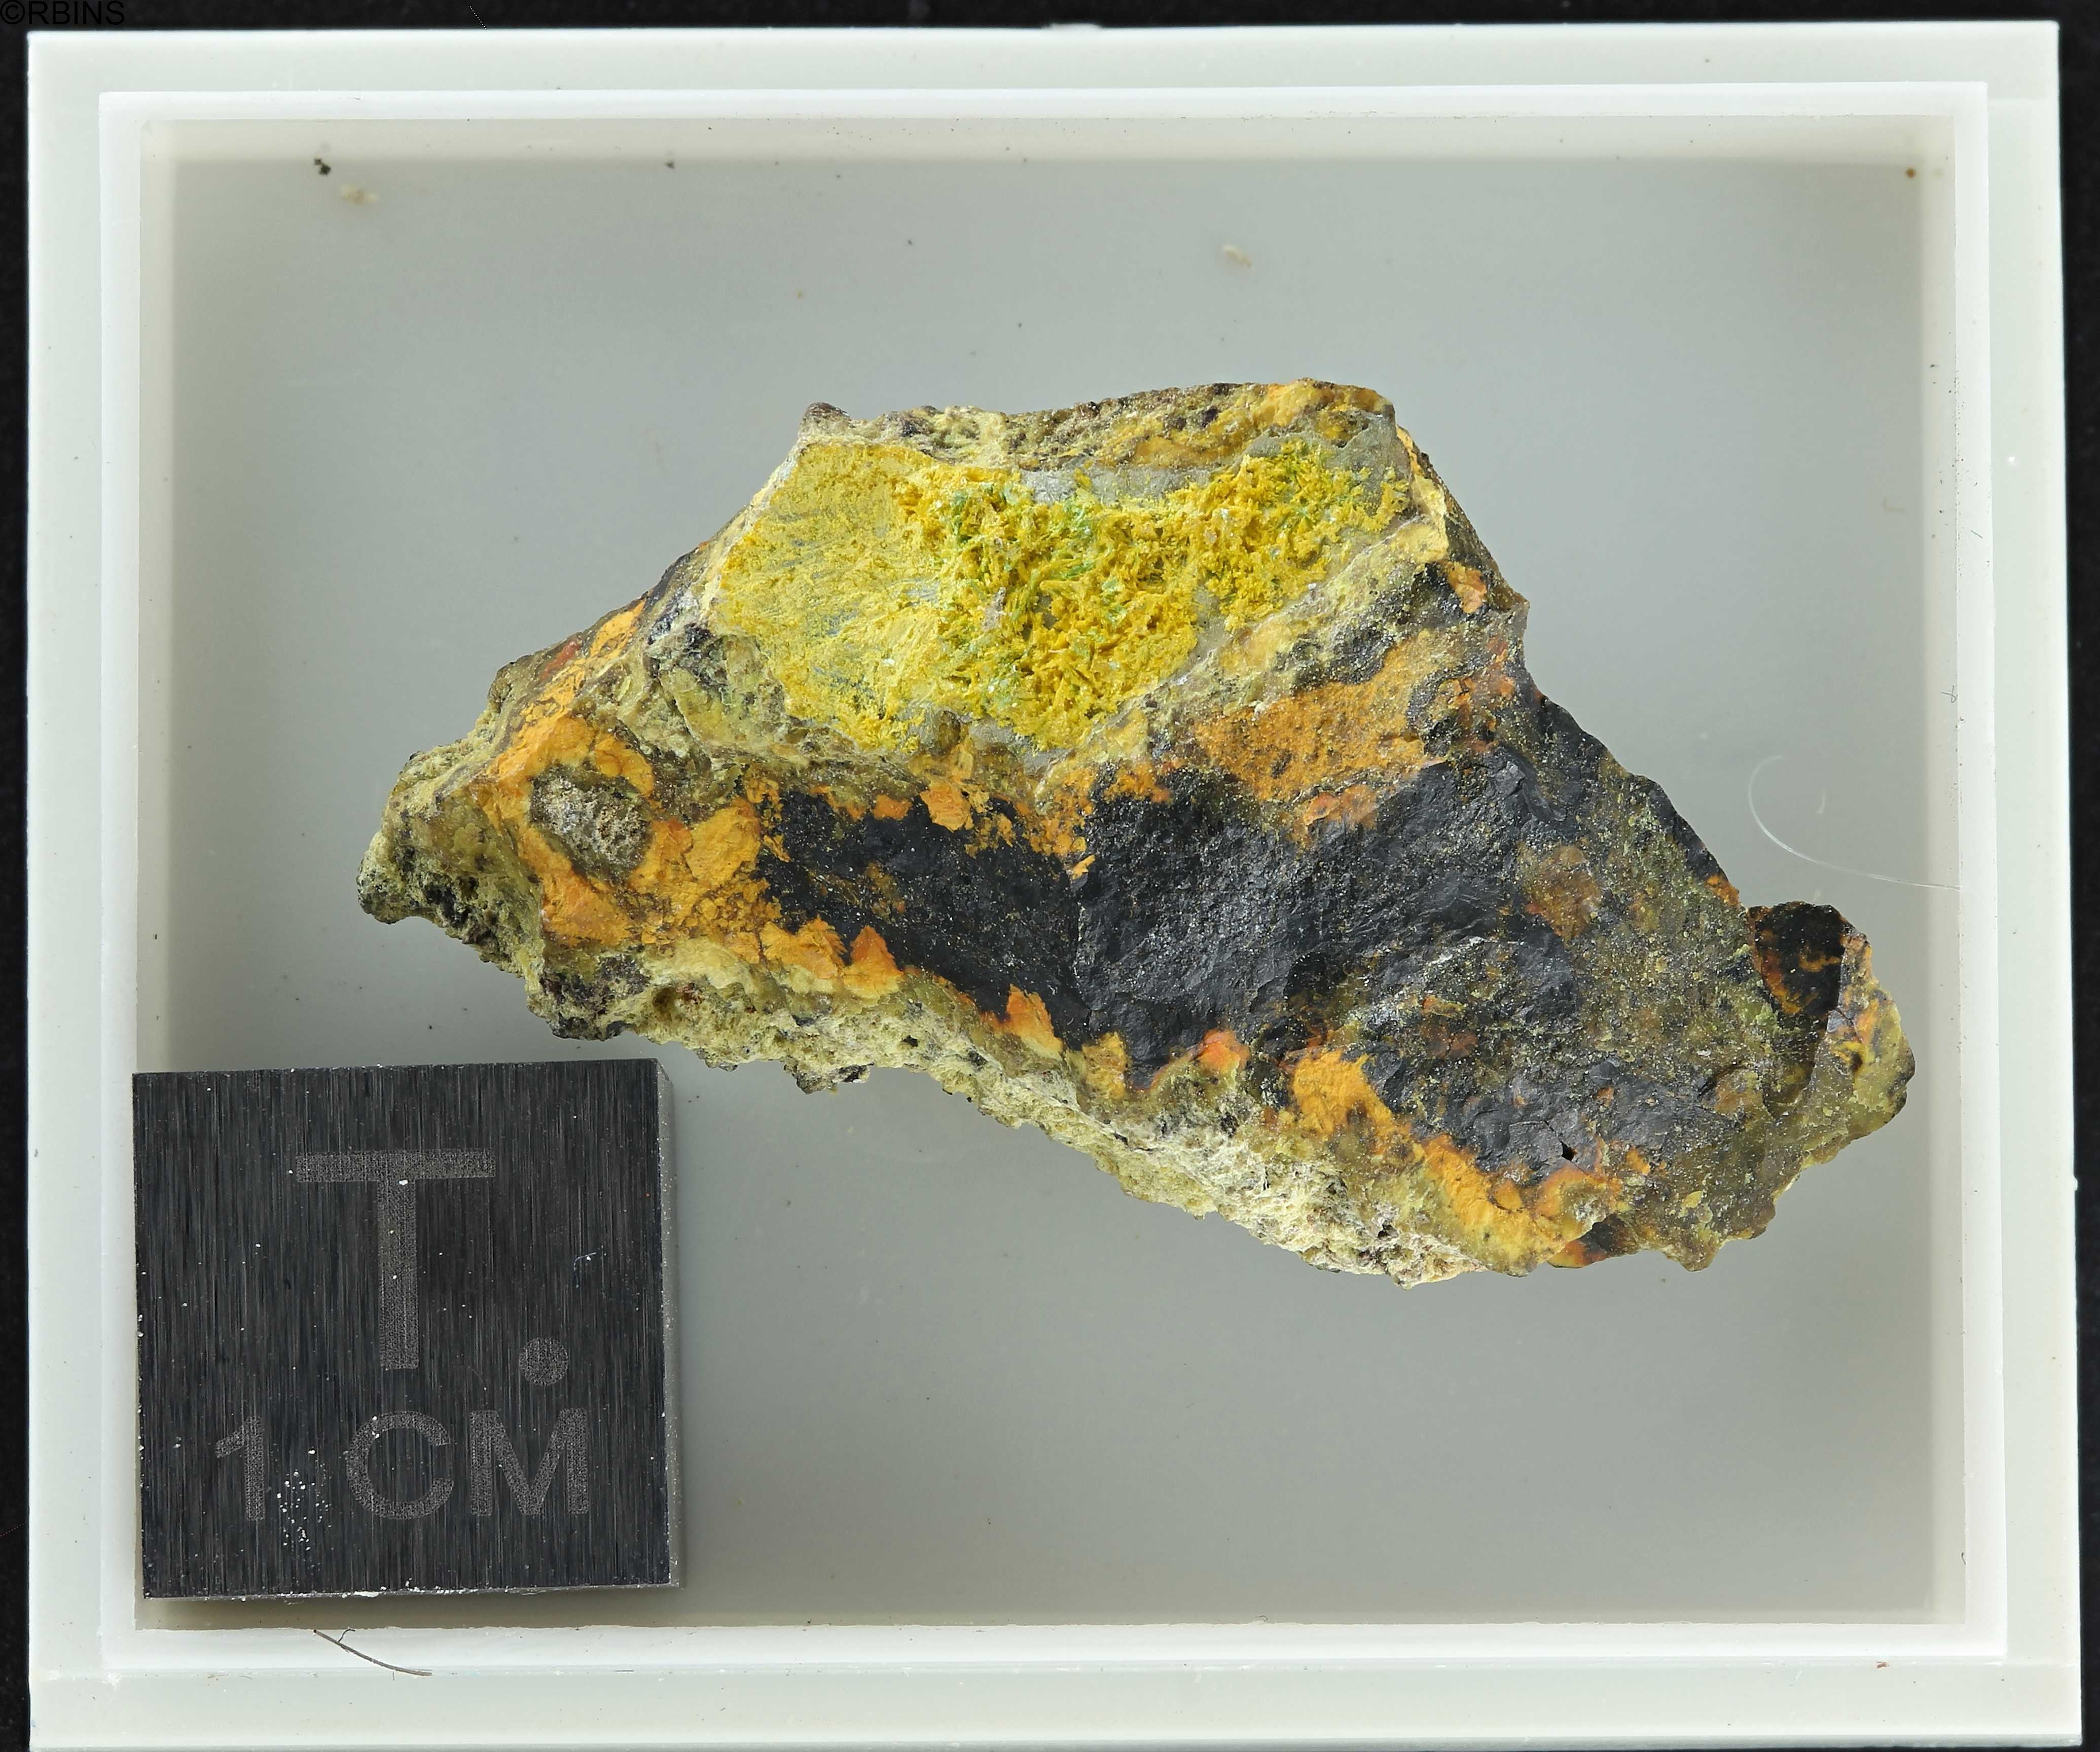 rc3512-holotype-zs-pmax_dxo_lowq.jpg